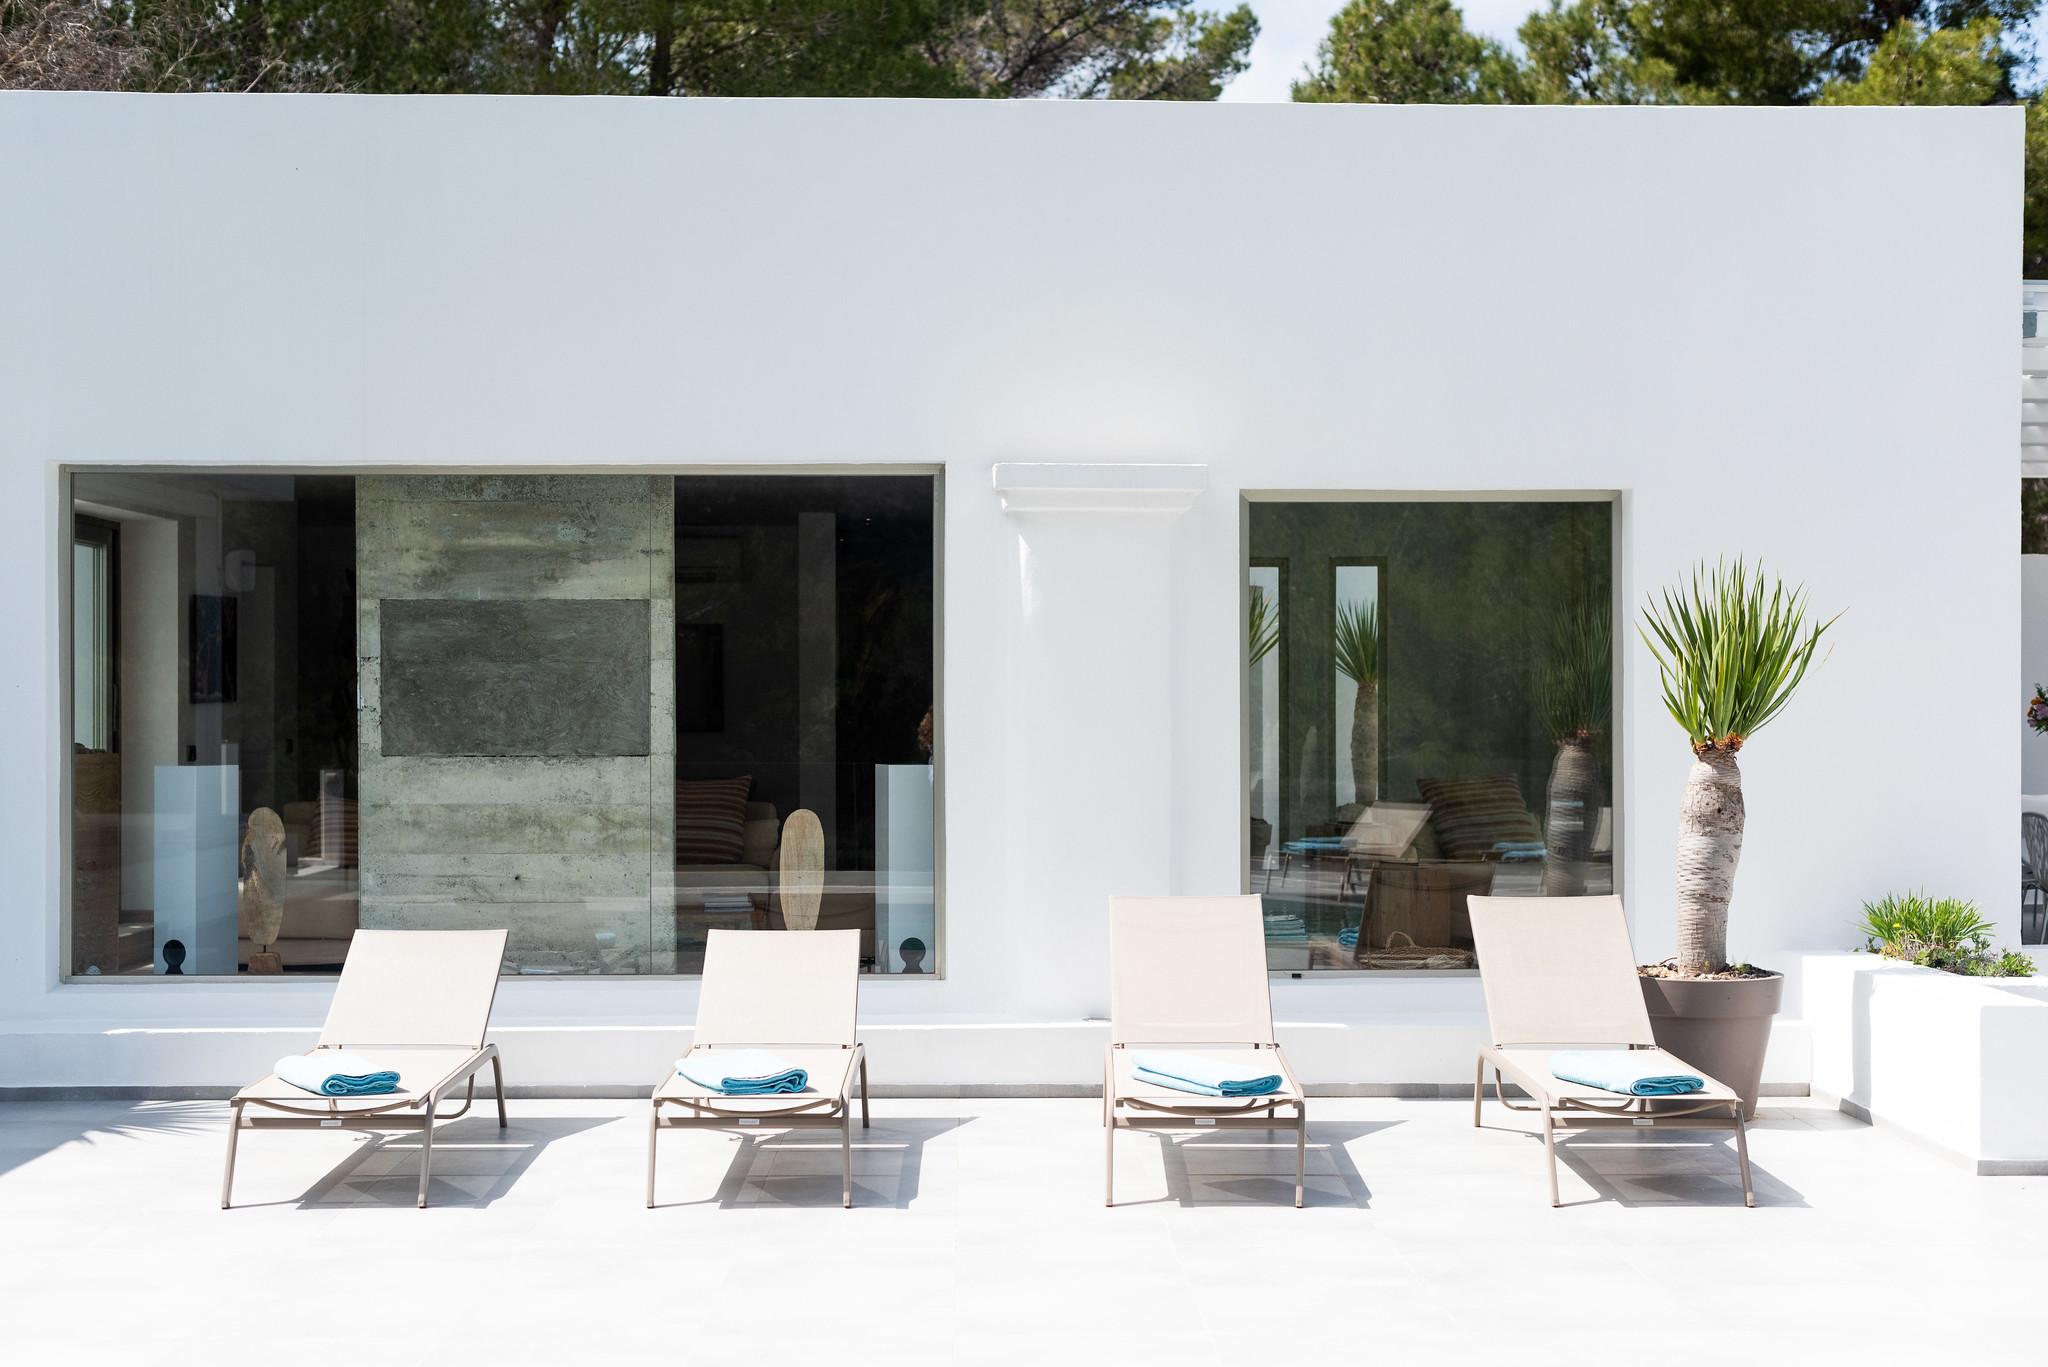 https://www.white-ibiza.com/wp-content/uploads/2020/05/white-ibiza-villas-can-dela-sun-loungers.jpg